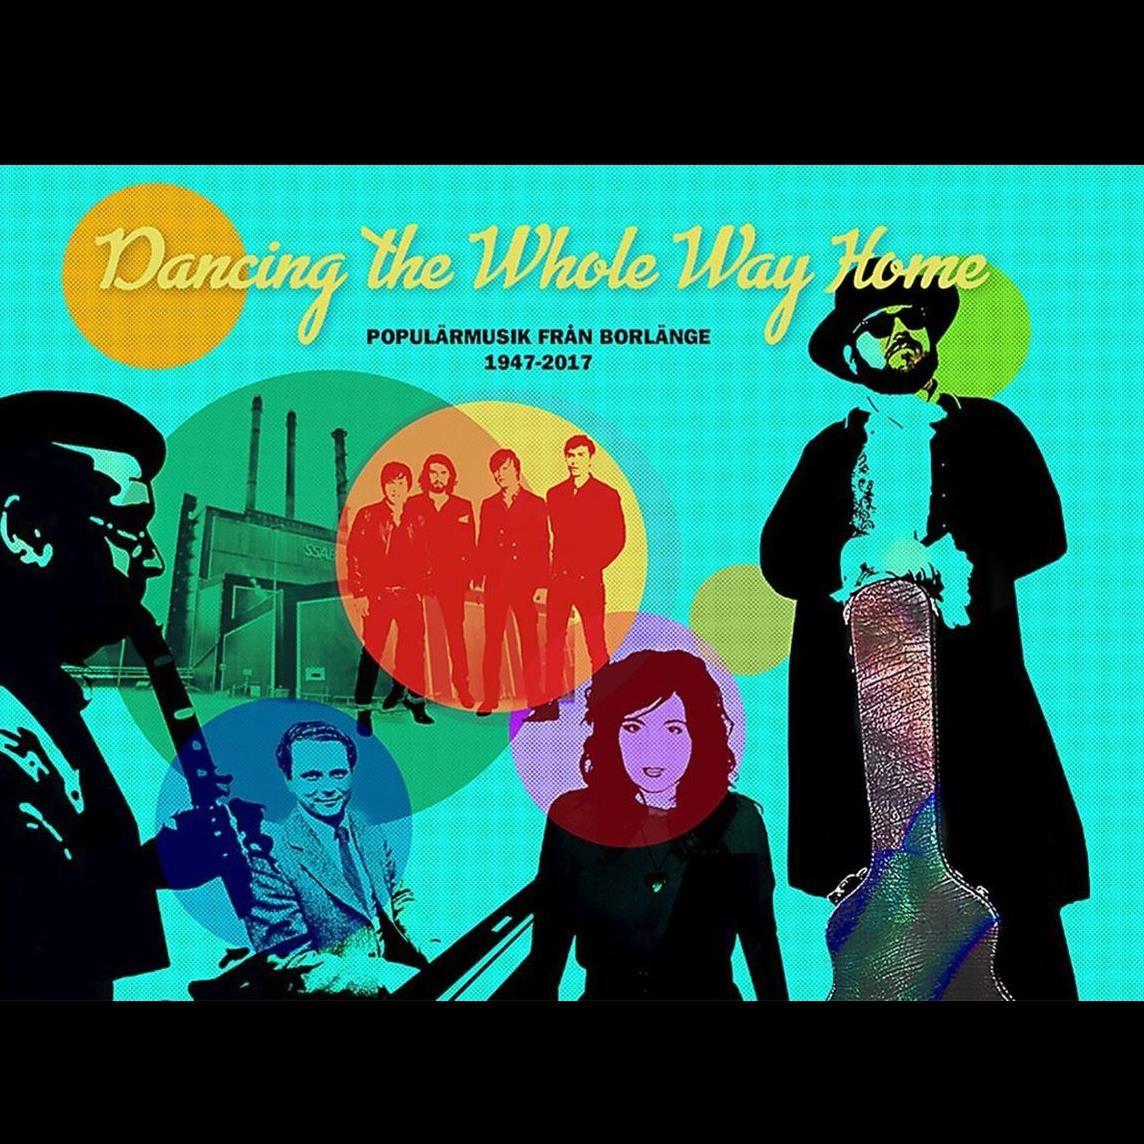 Boksläpp- Dancing the Whole Way Home